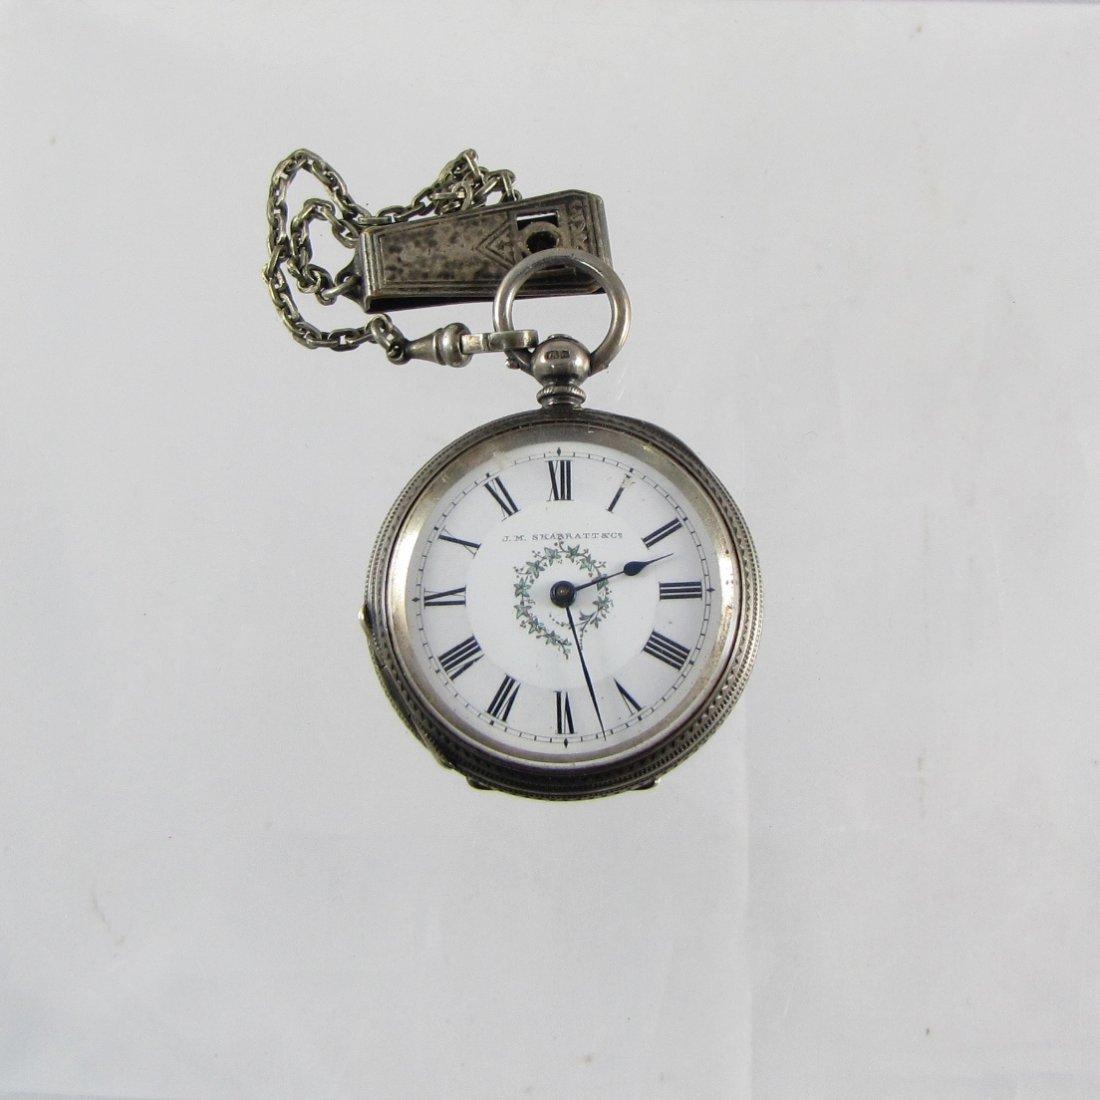 J M SKABRATT&C Watch